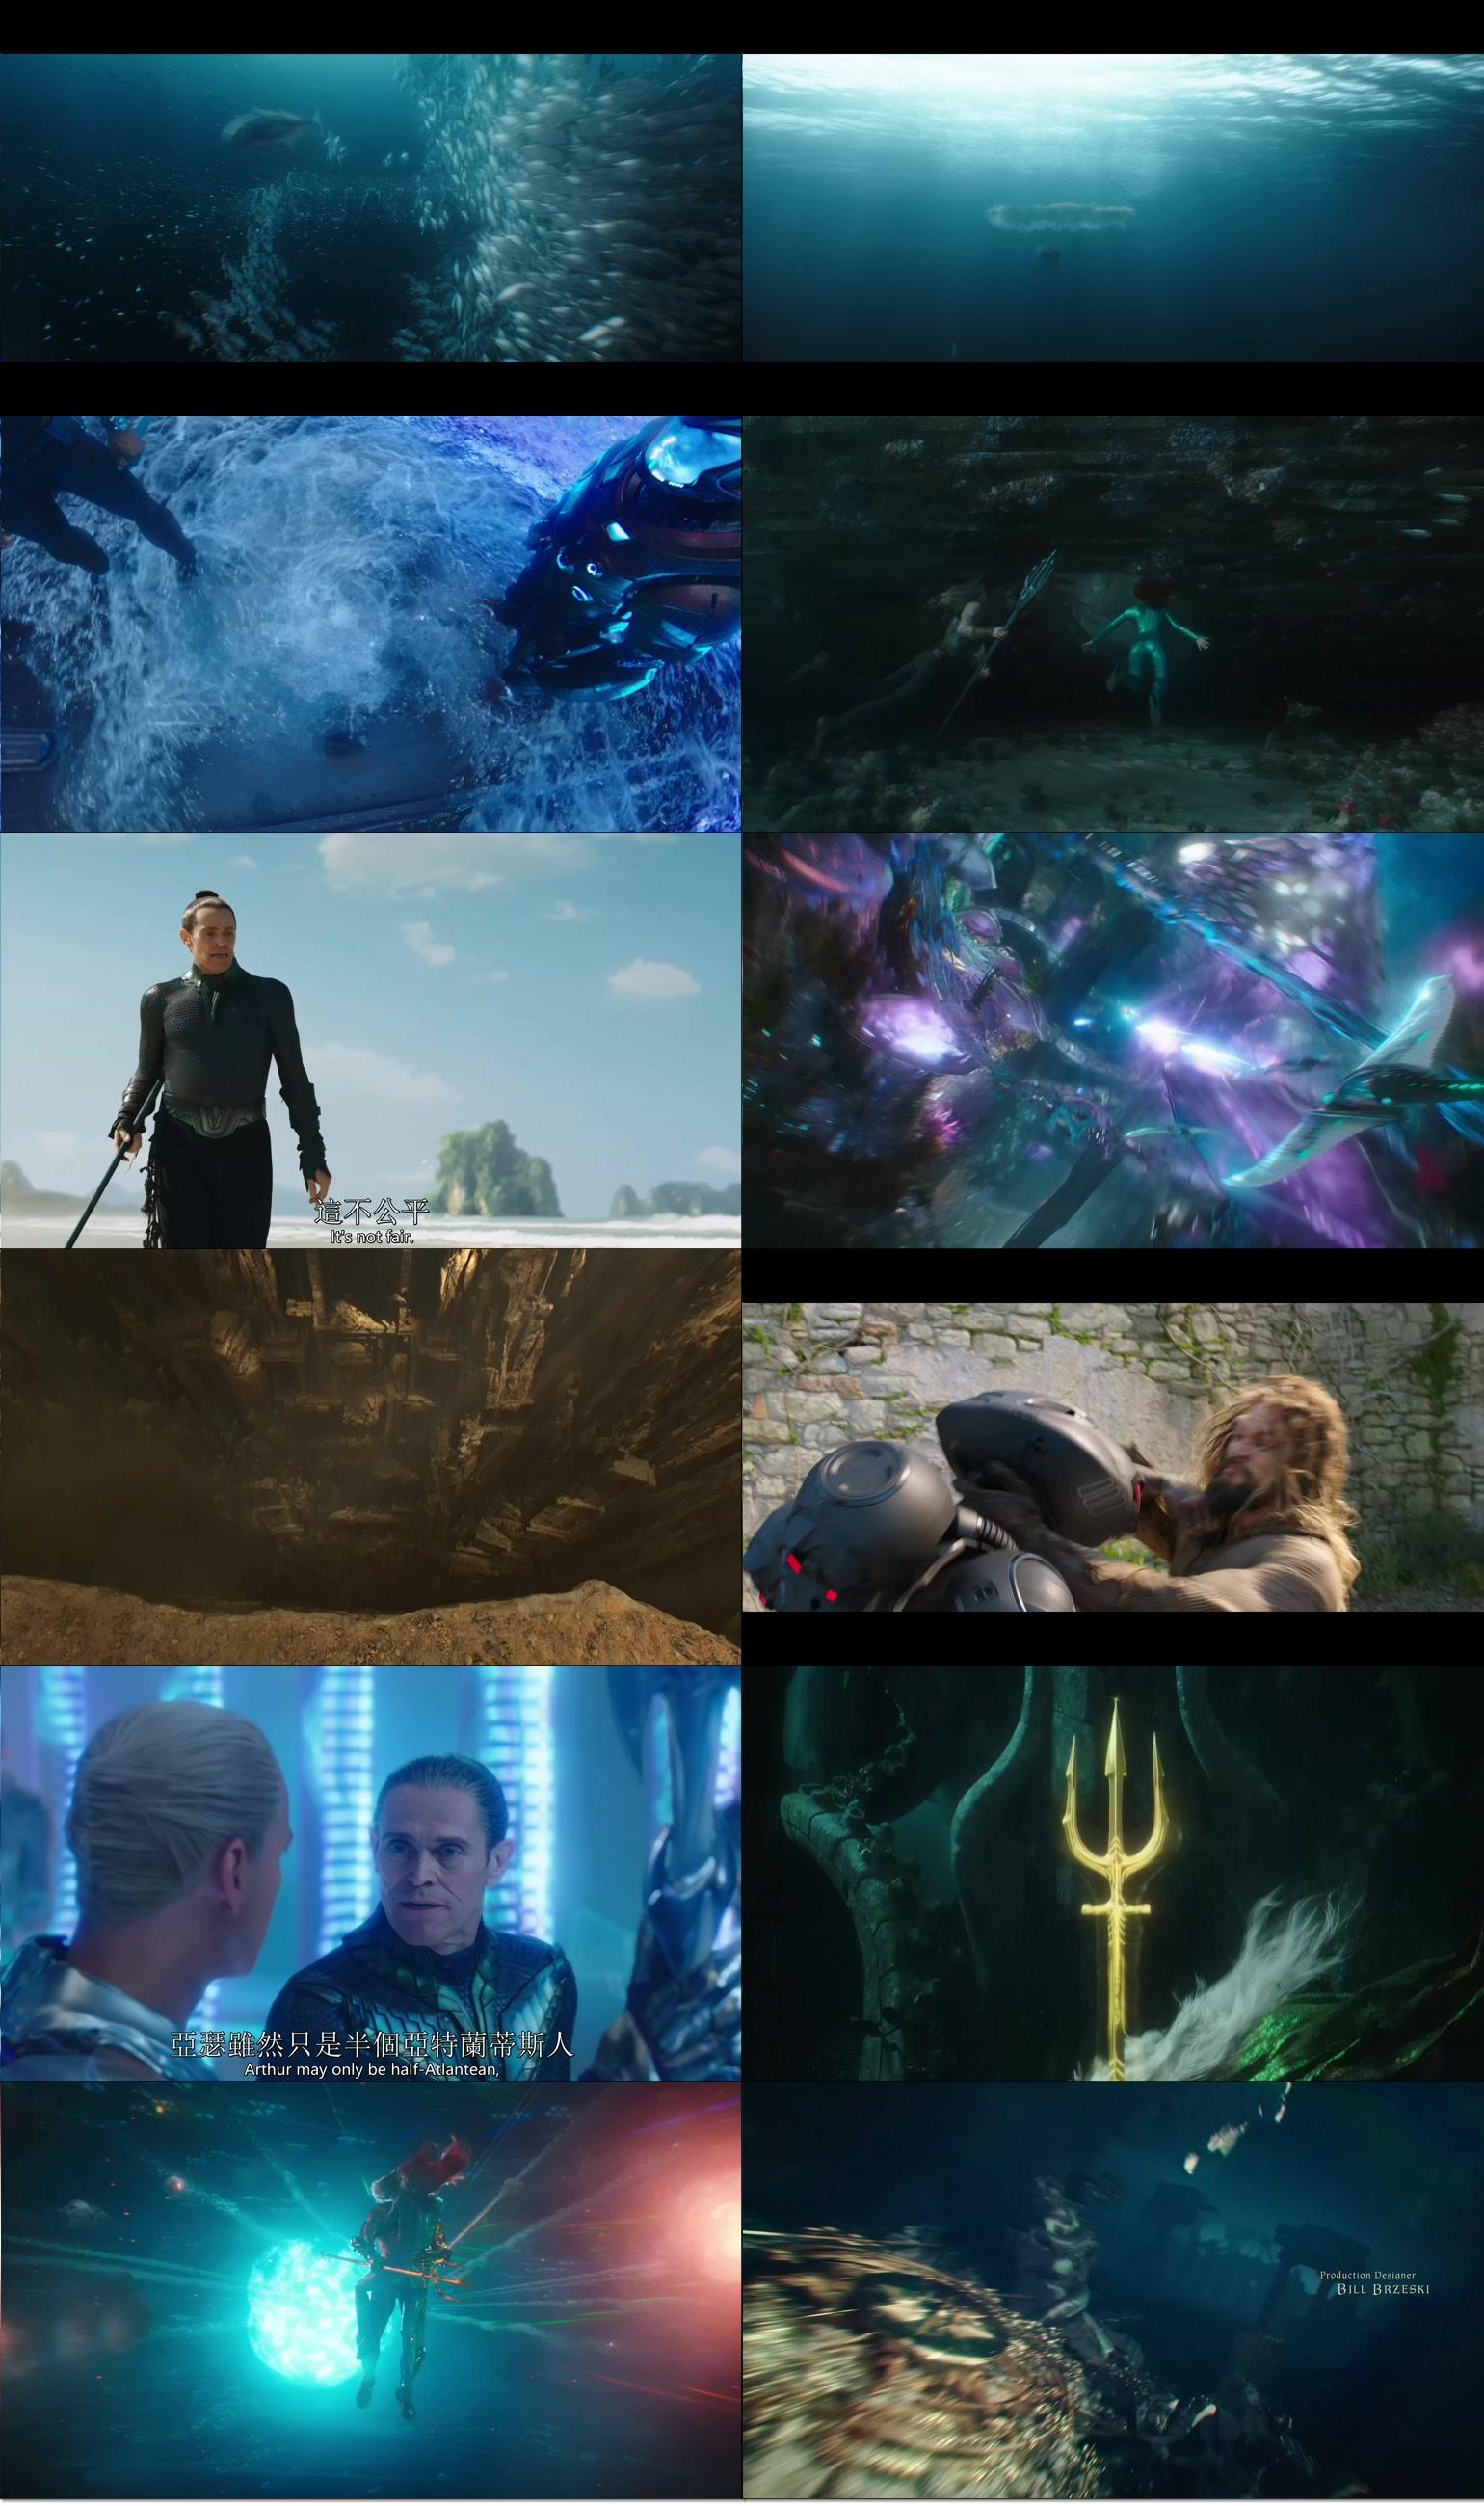 Aquaman.2018.1080p.BluRay.x264-SPARKS.mkv